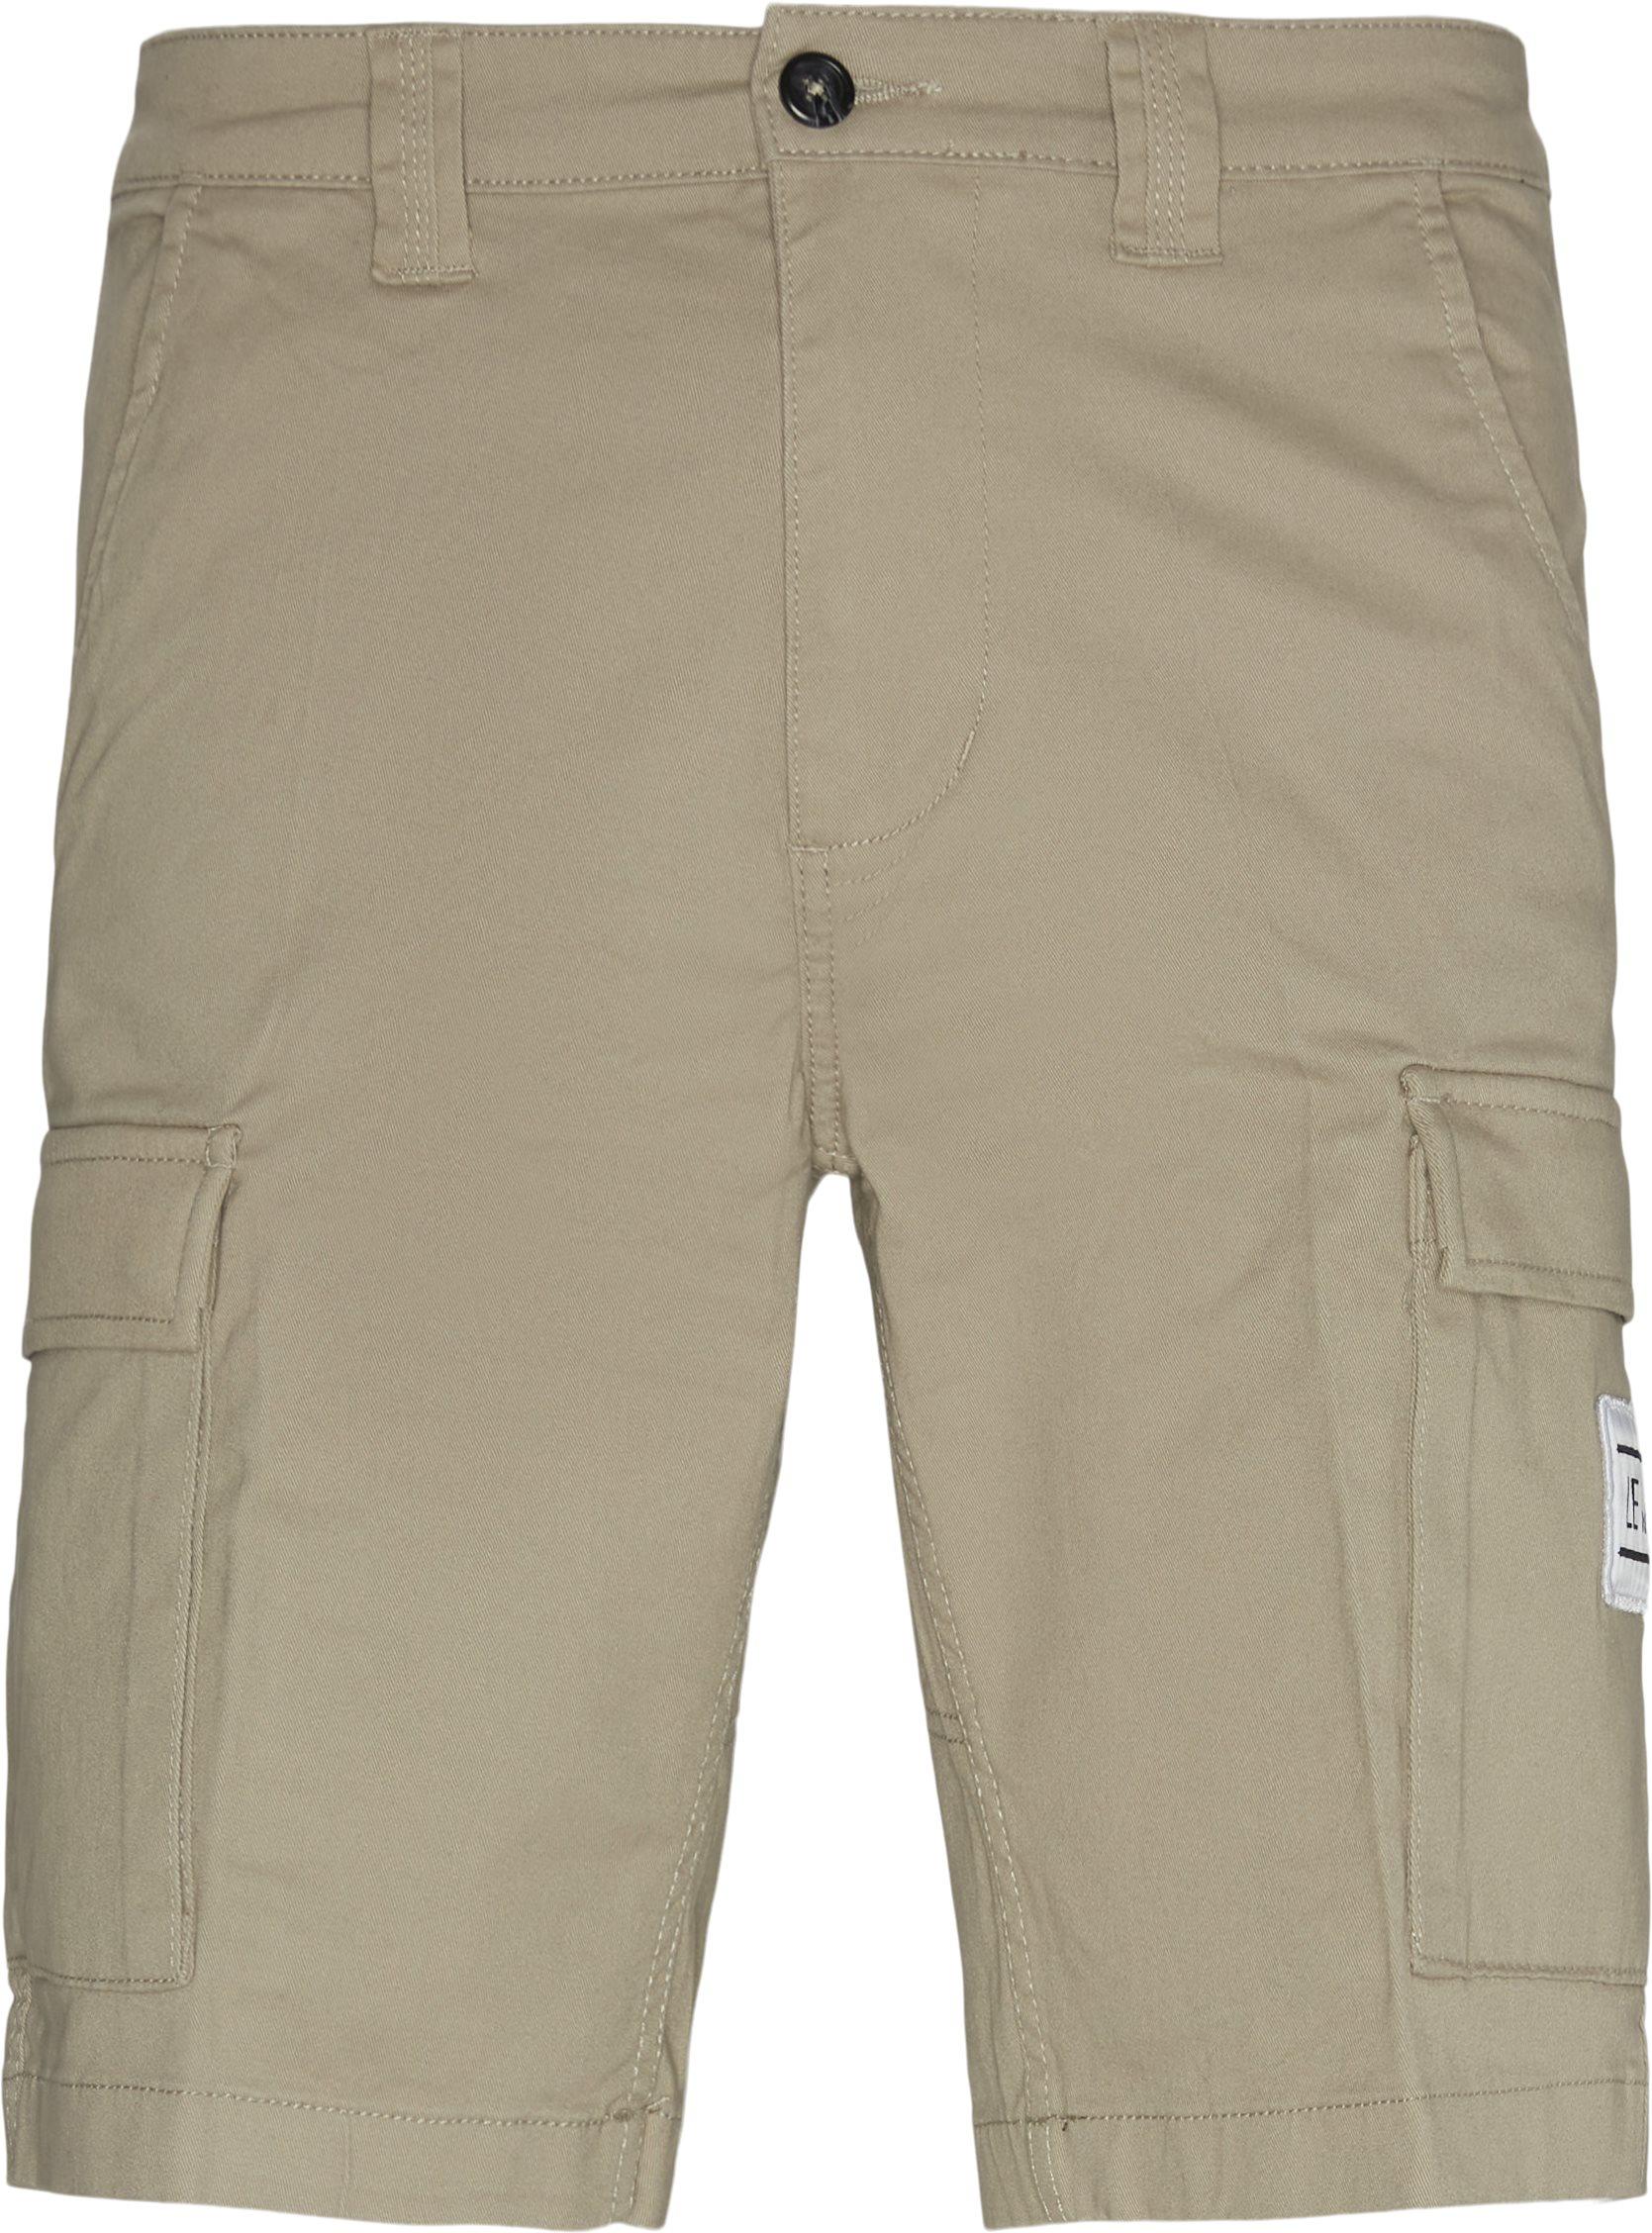 Cedric Shorts - Shorts - Loose - Sand